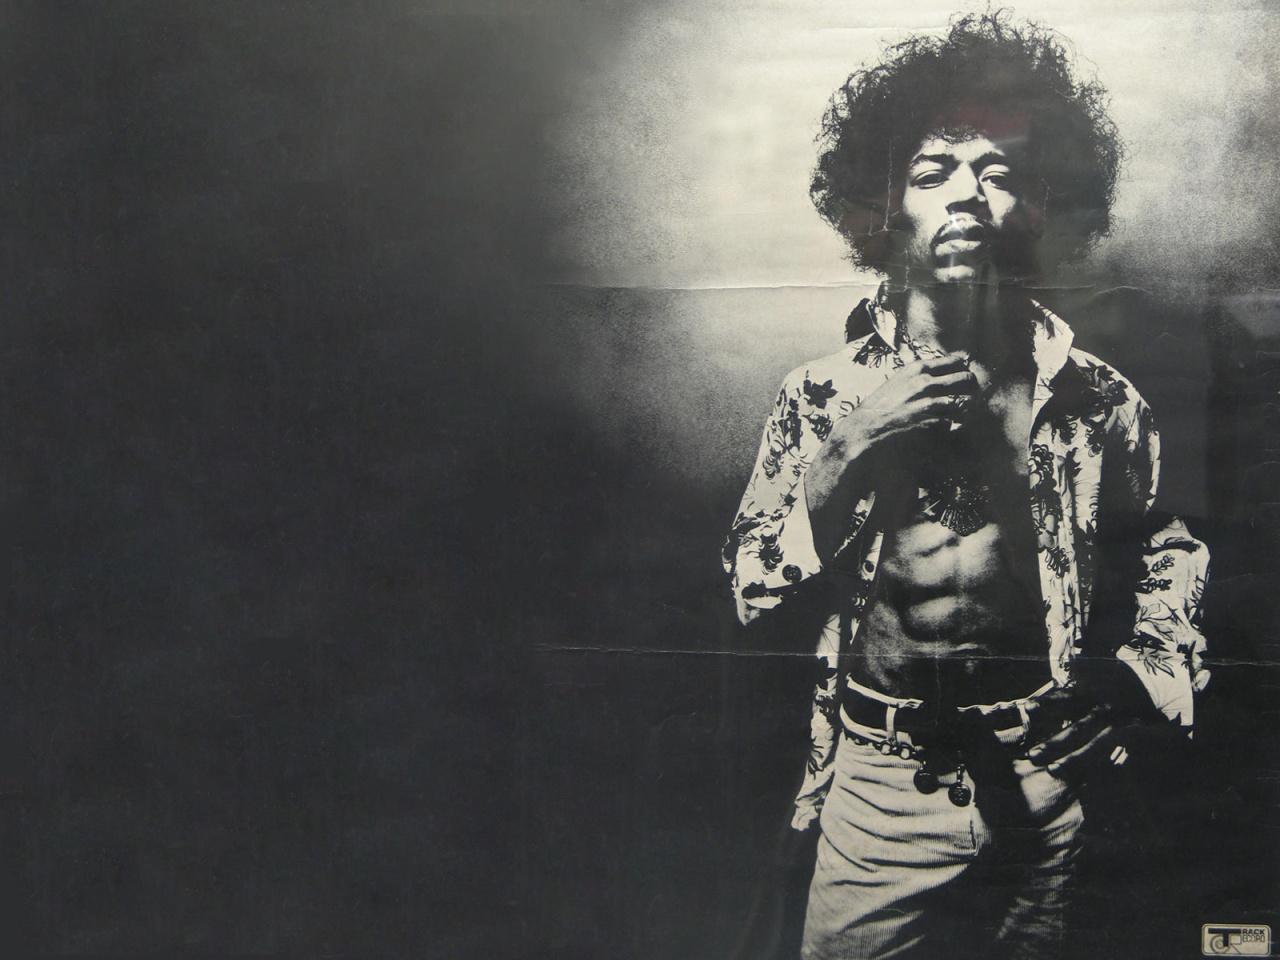 Free Download Download Papyleblues Jimi Hendrix Wallpaper